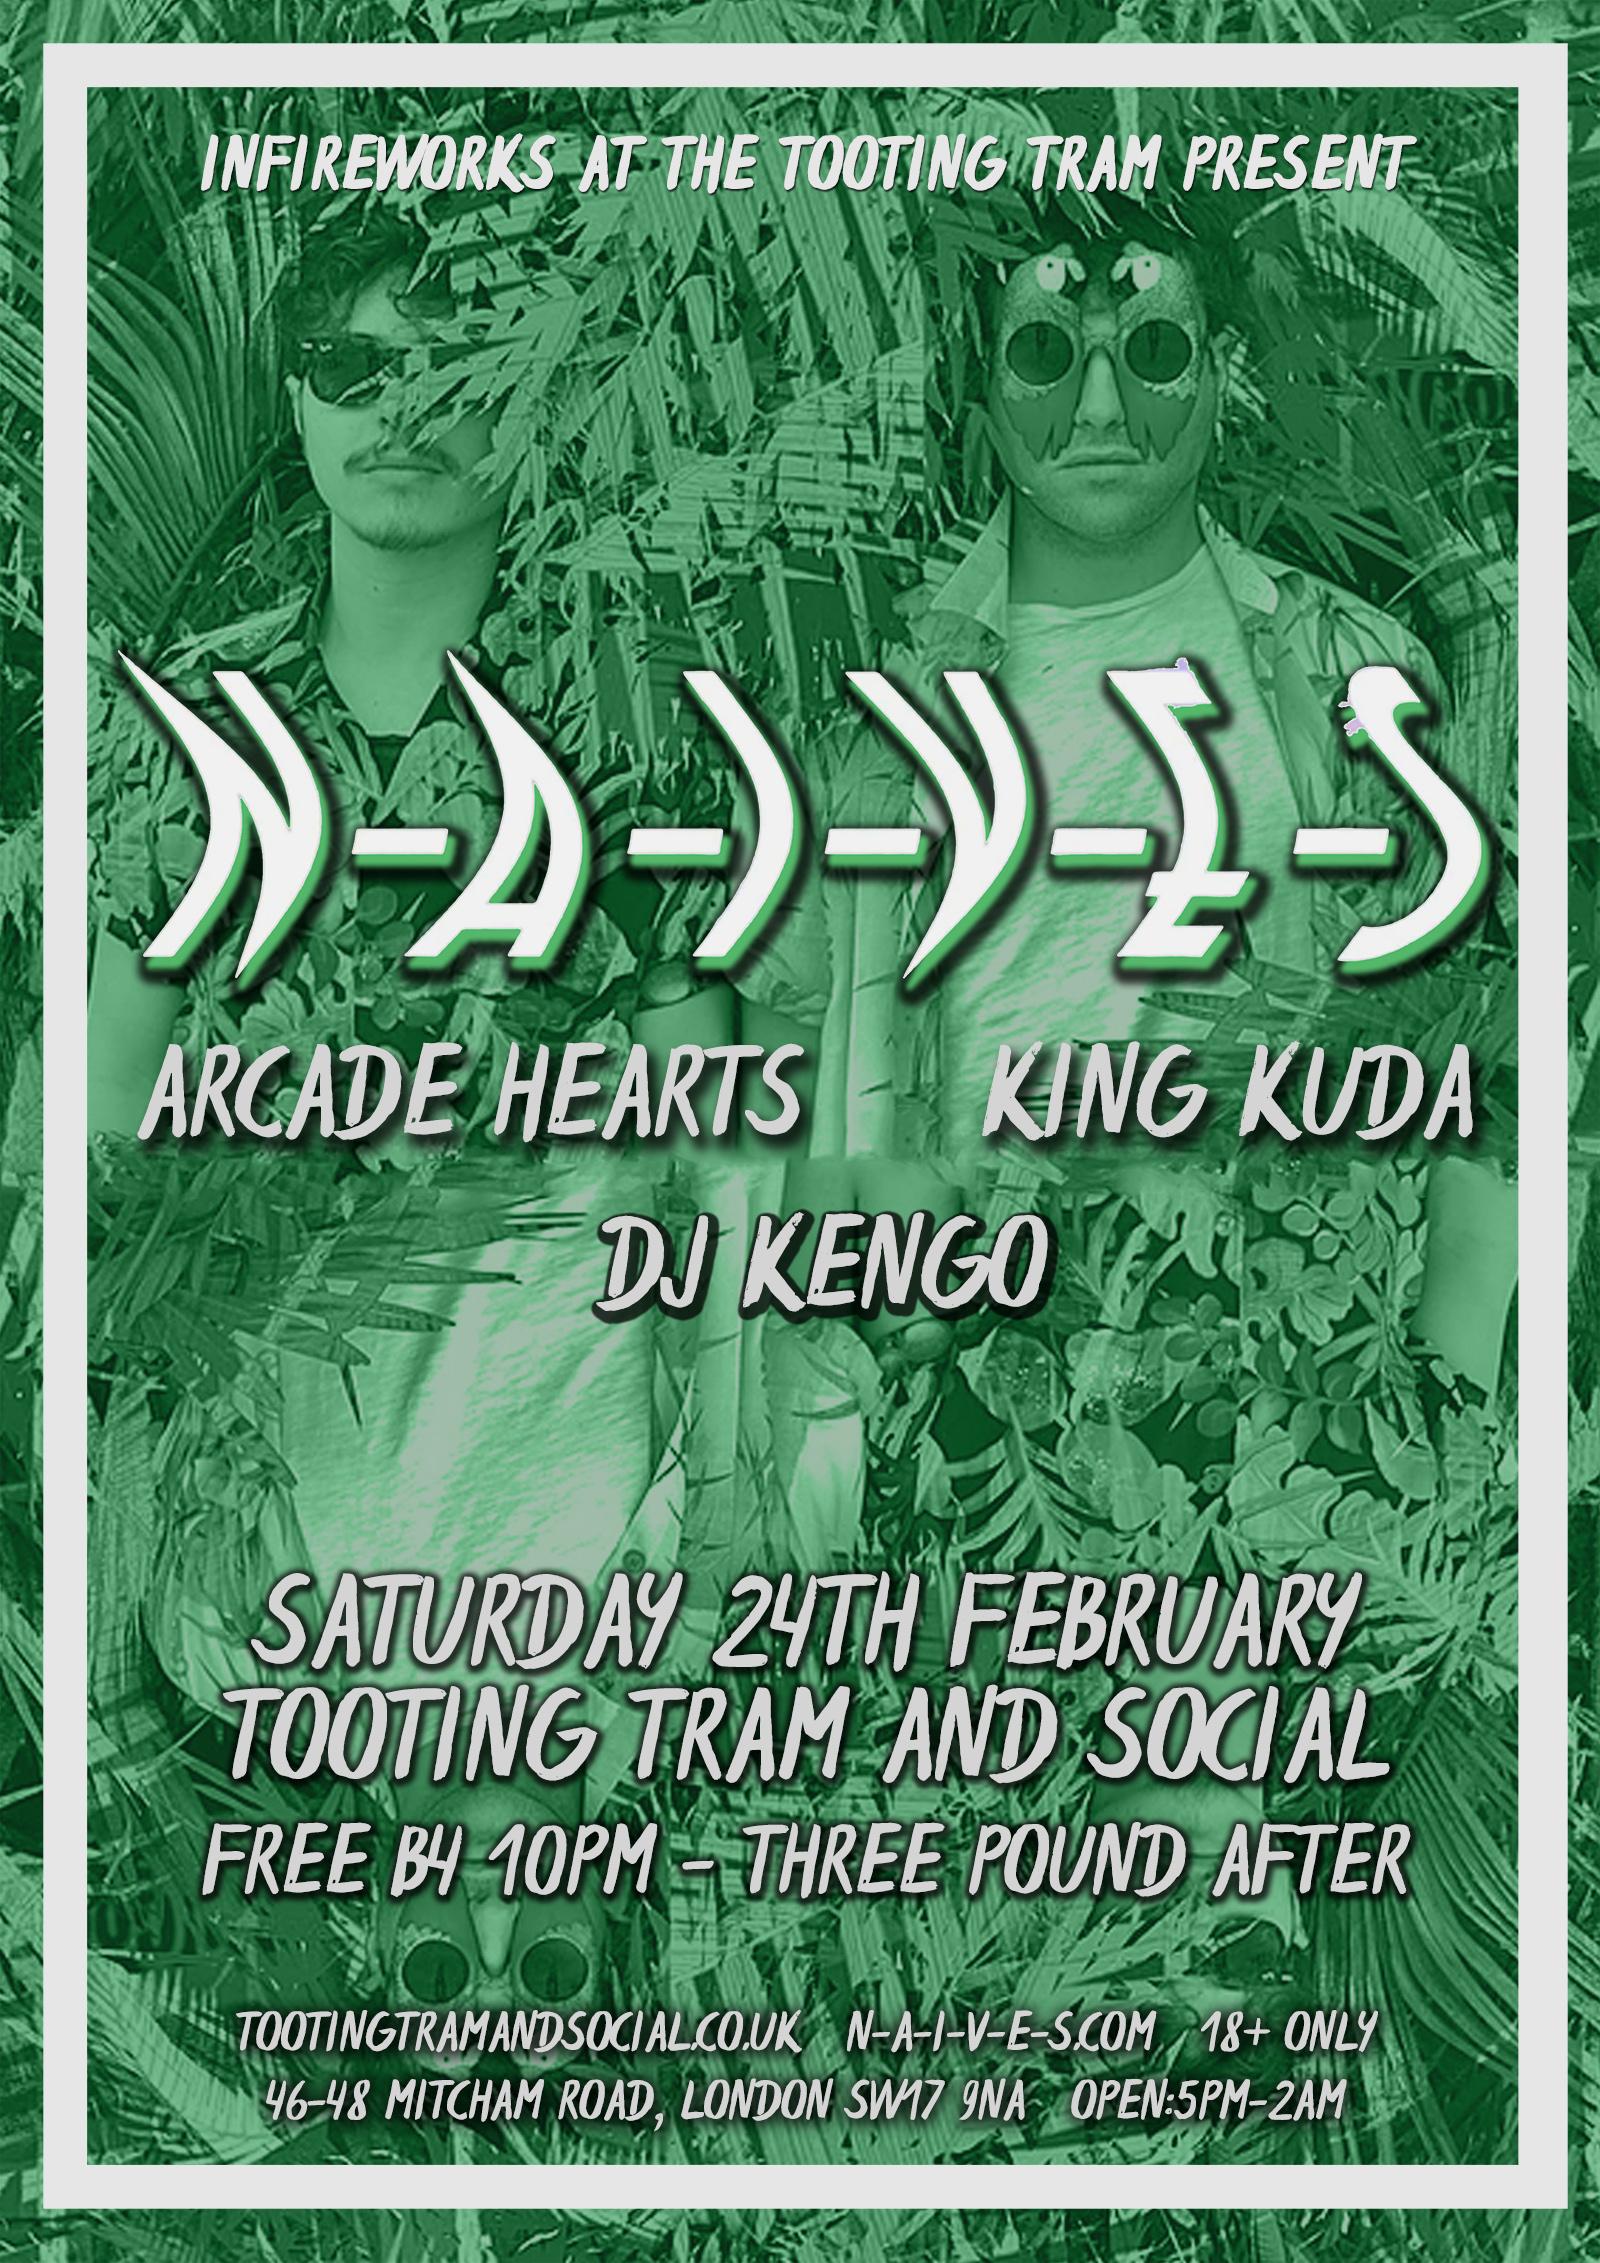 InFireworks: N-A-I-V-E-S, Arcade Hearts, King Kuda / DJ Kengo